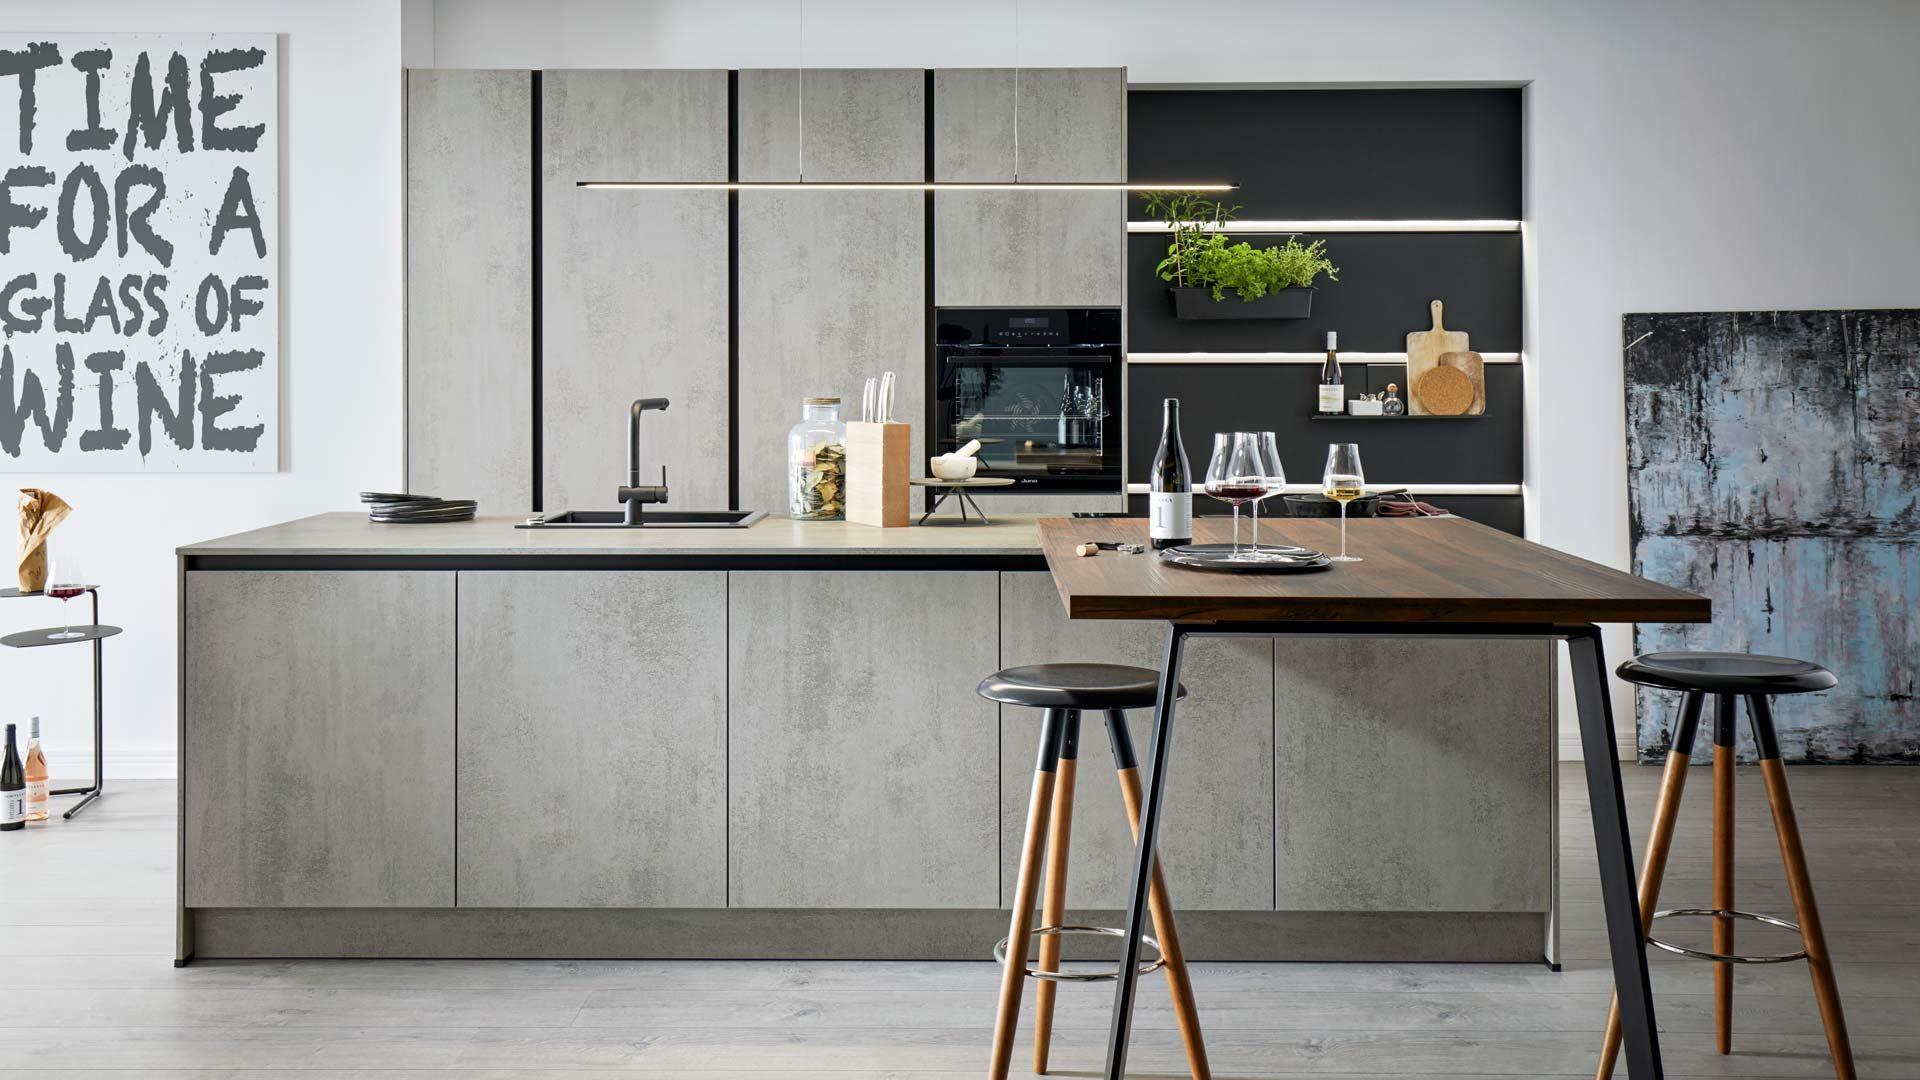 Küchentrends 2021 - modernes Design, innovative Technologien